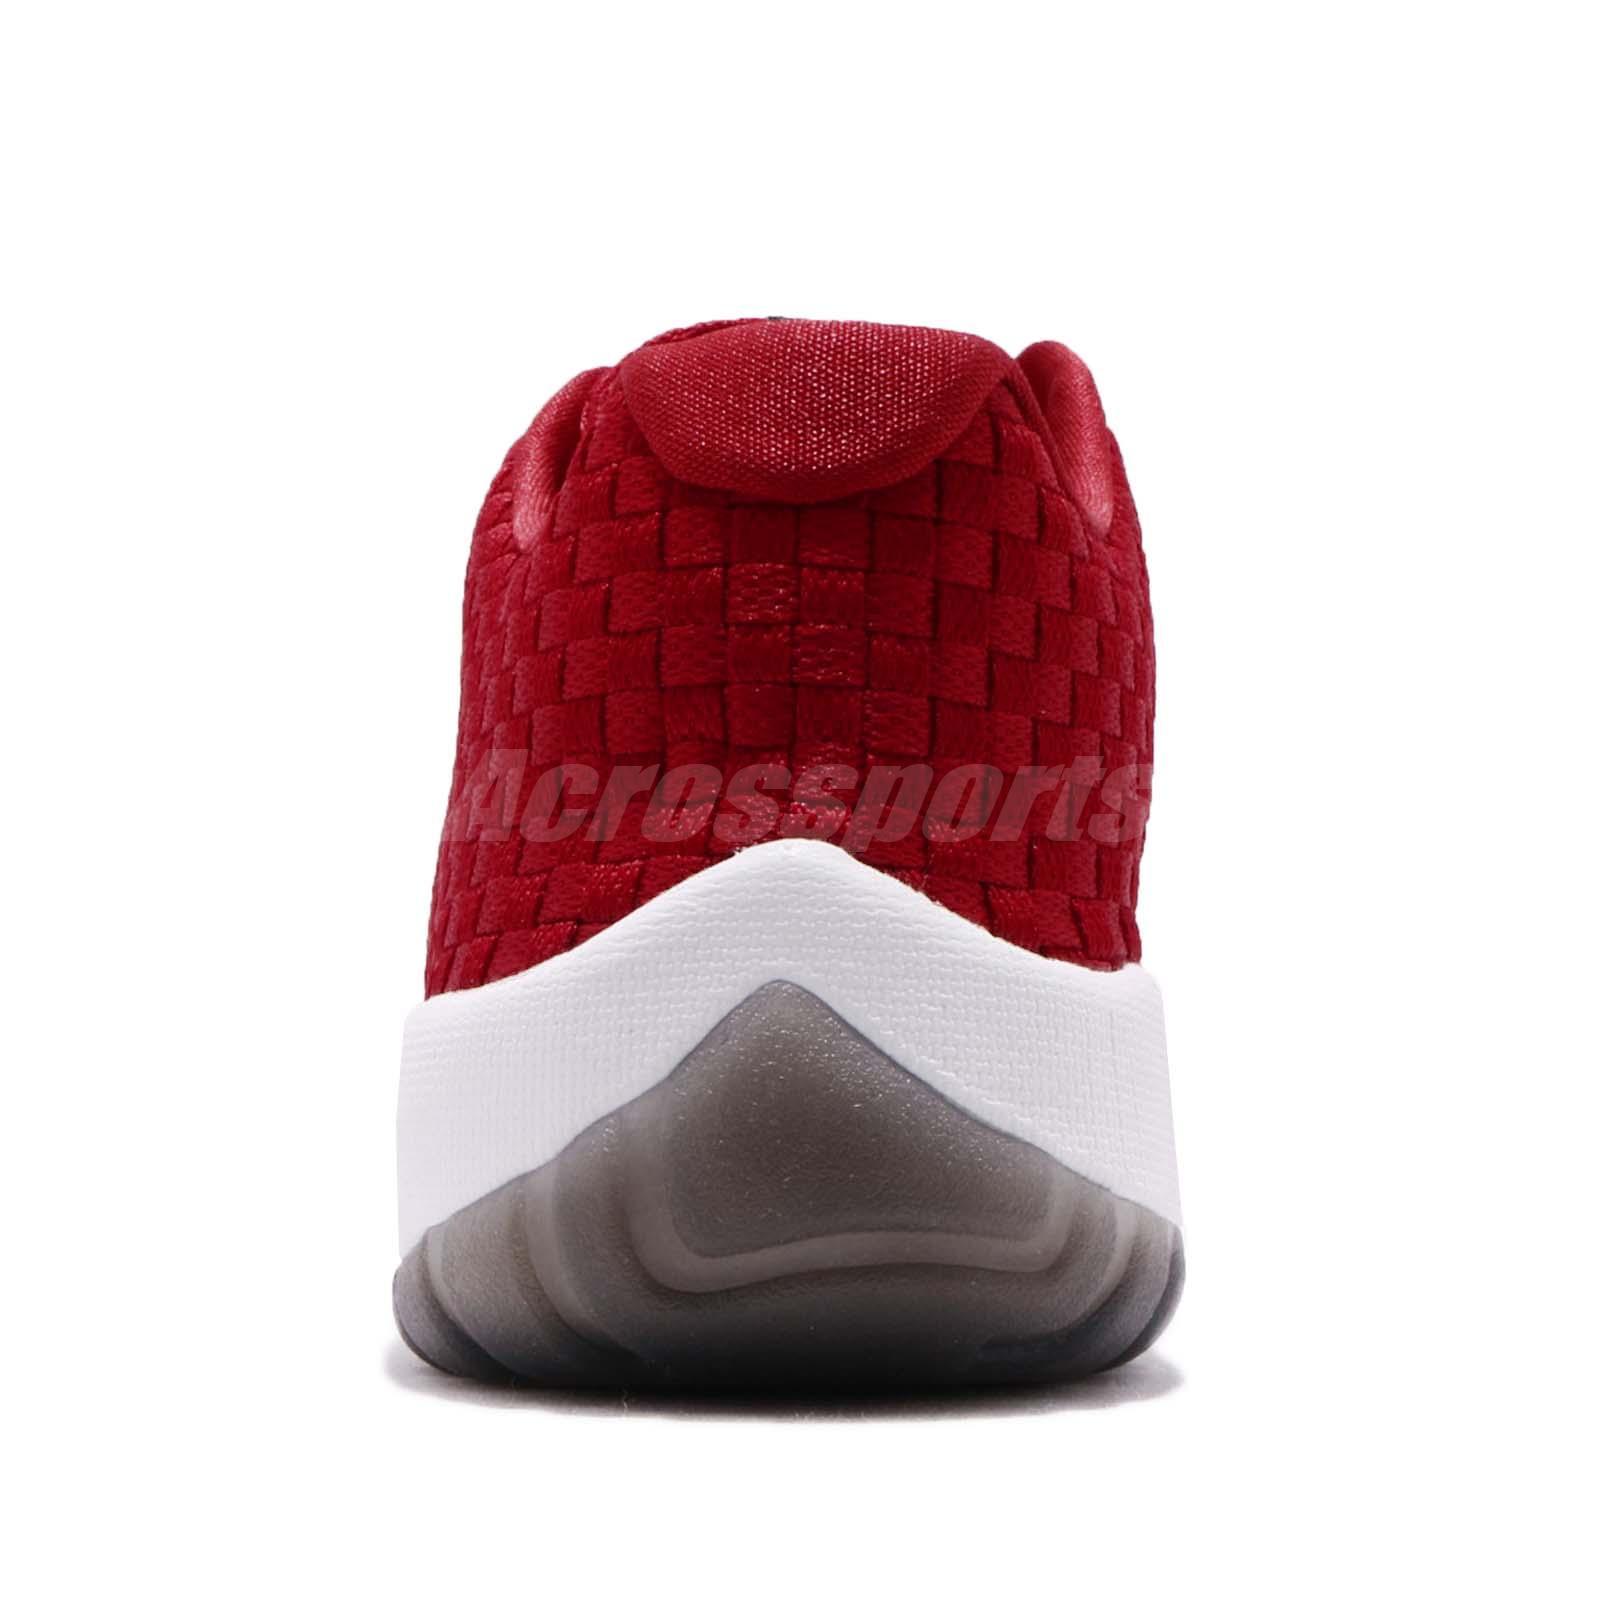 3dddebf8946664 Nike Air Jordan Future Low Gym Red White Woven Men Basketball Shoes ...